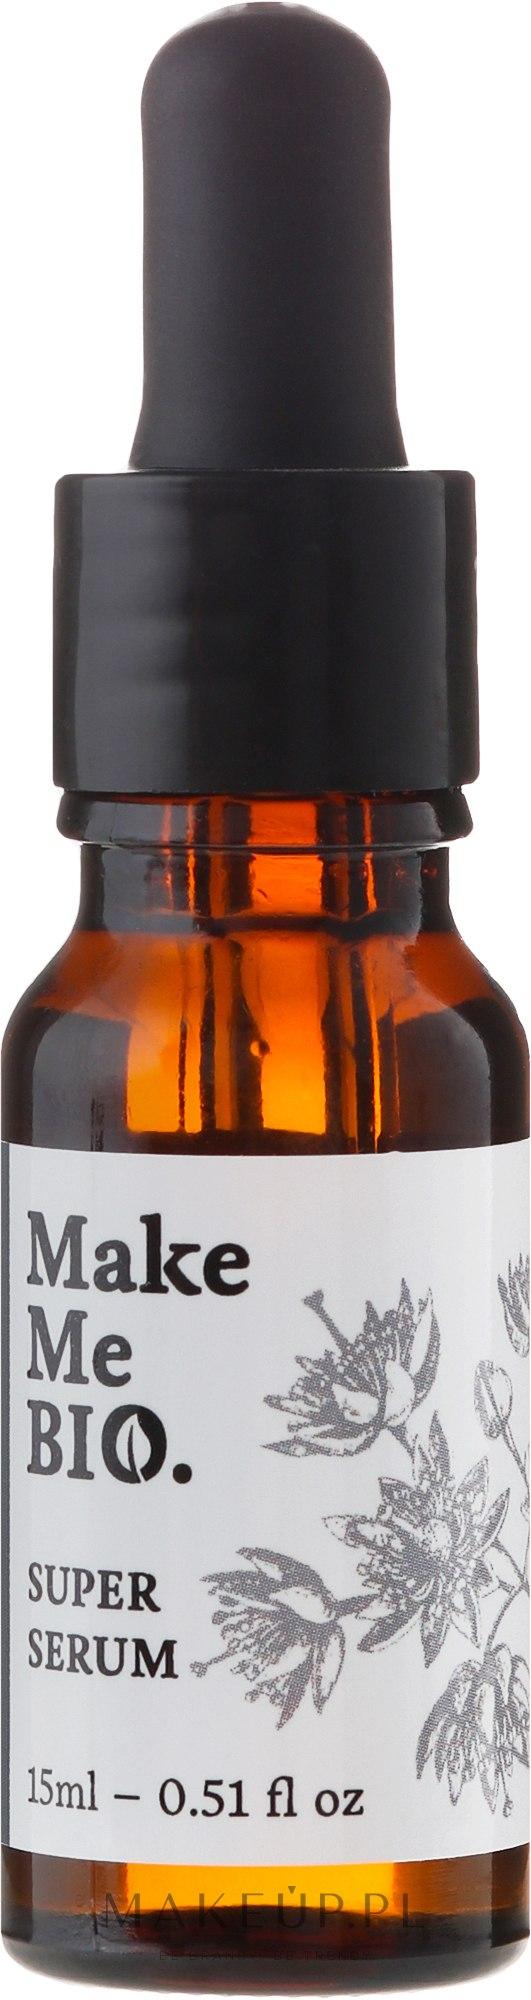 Intensywnie regenerujące serum do twarzy - Make Me Bio Super Serum — фото 15 ml